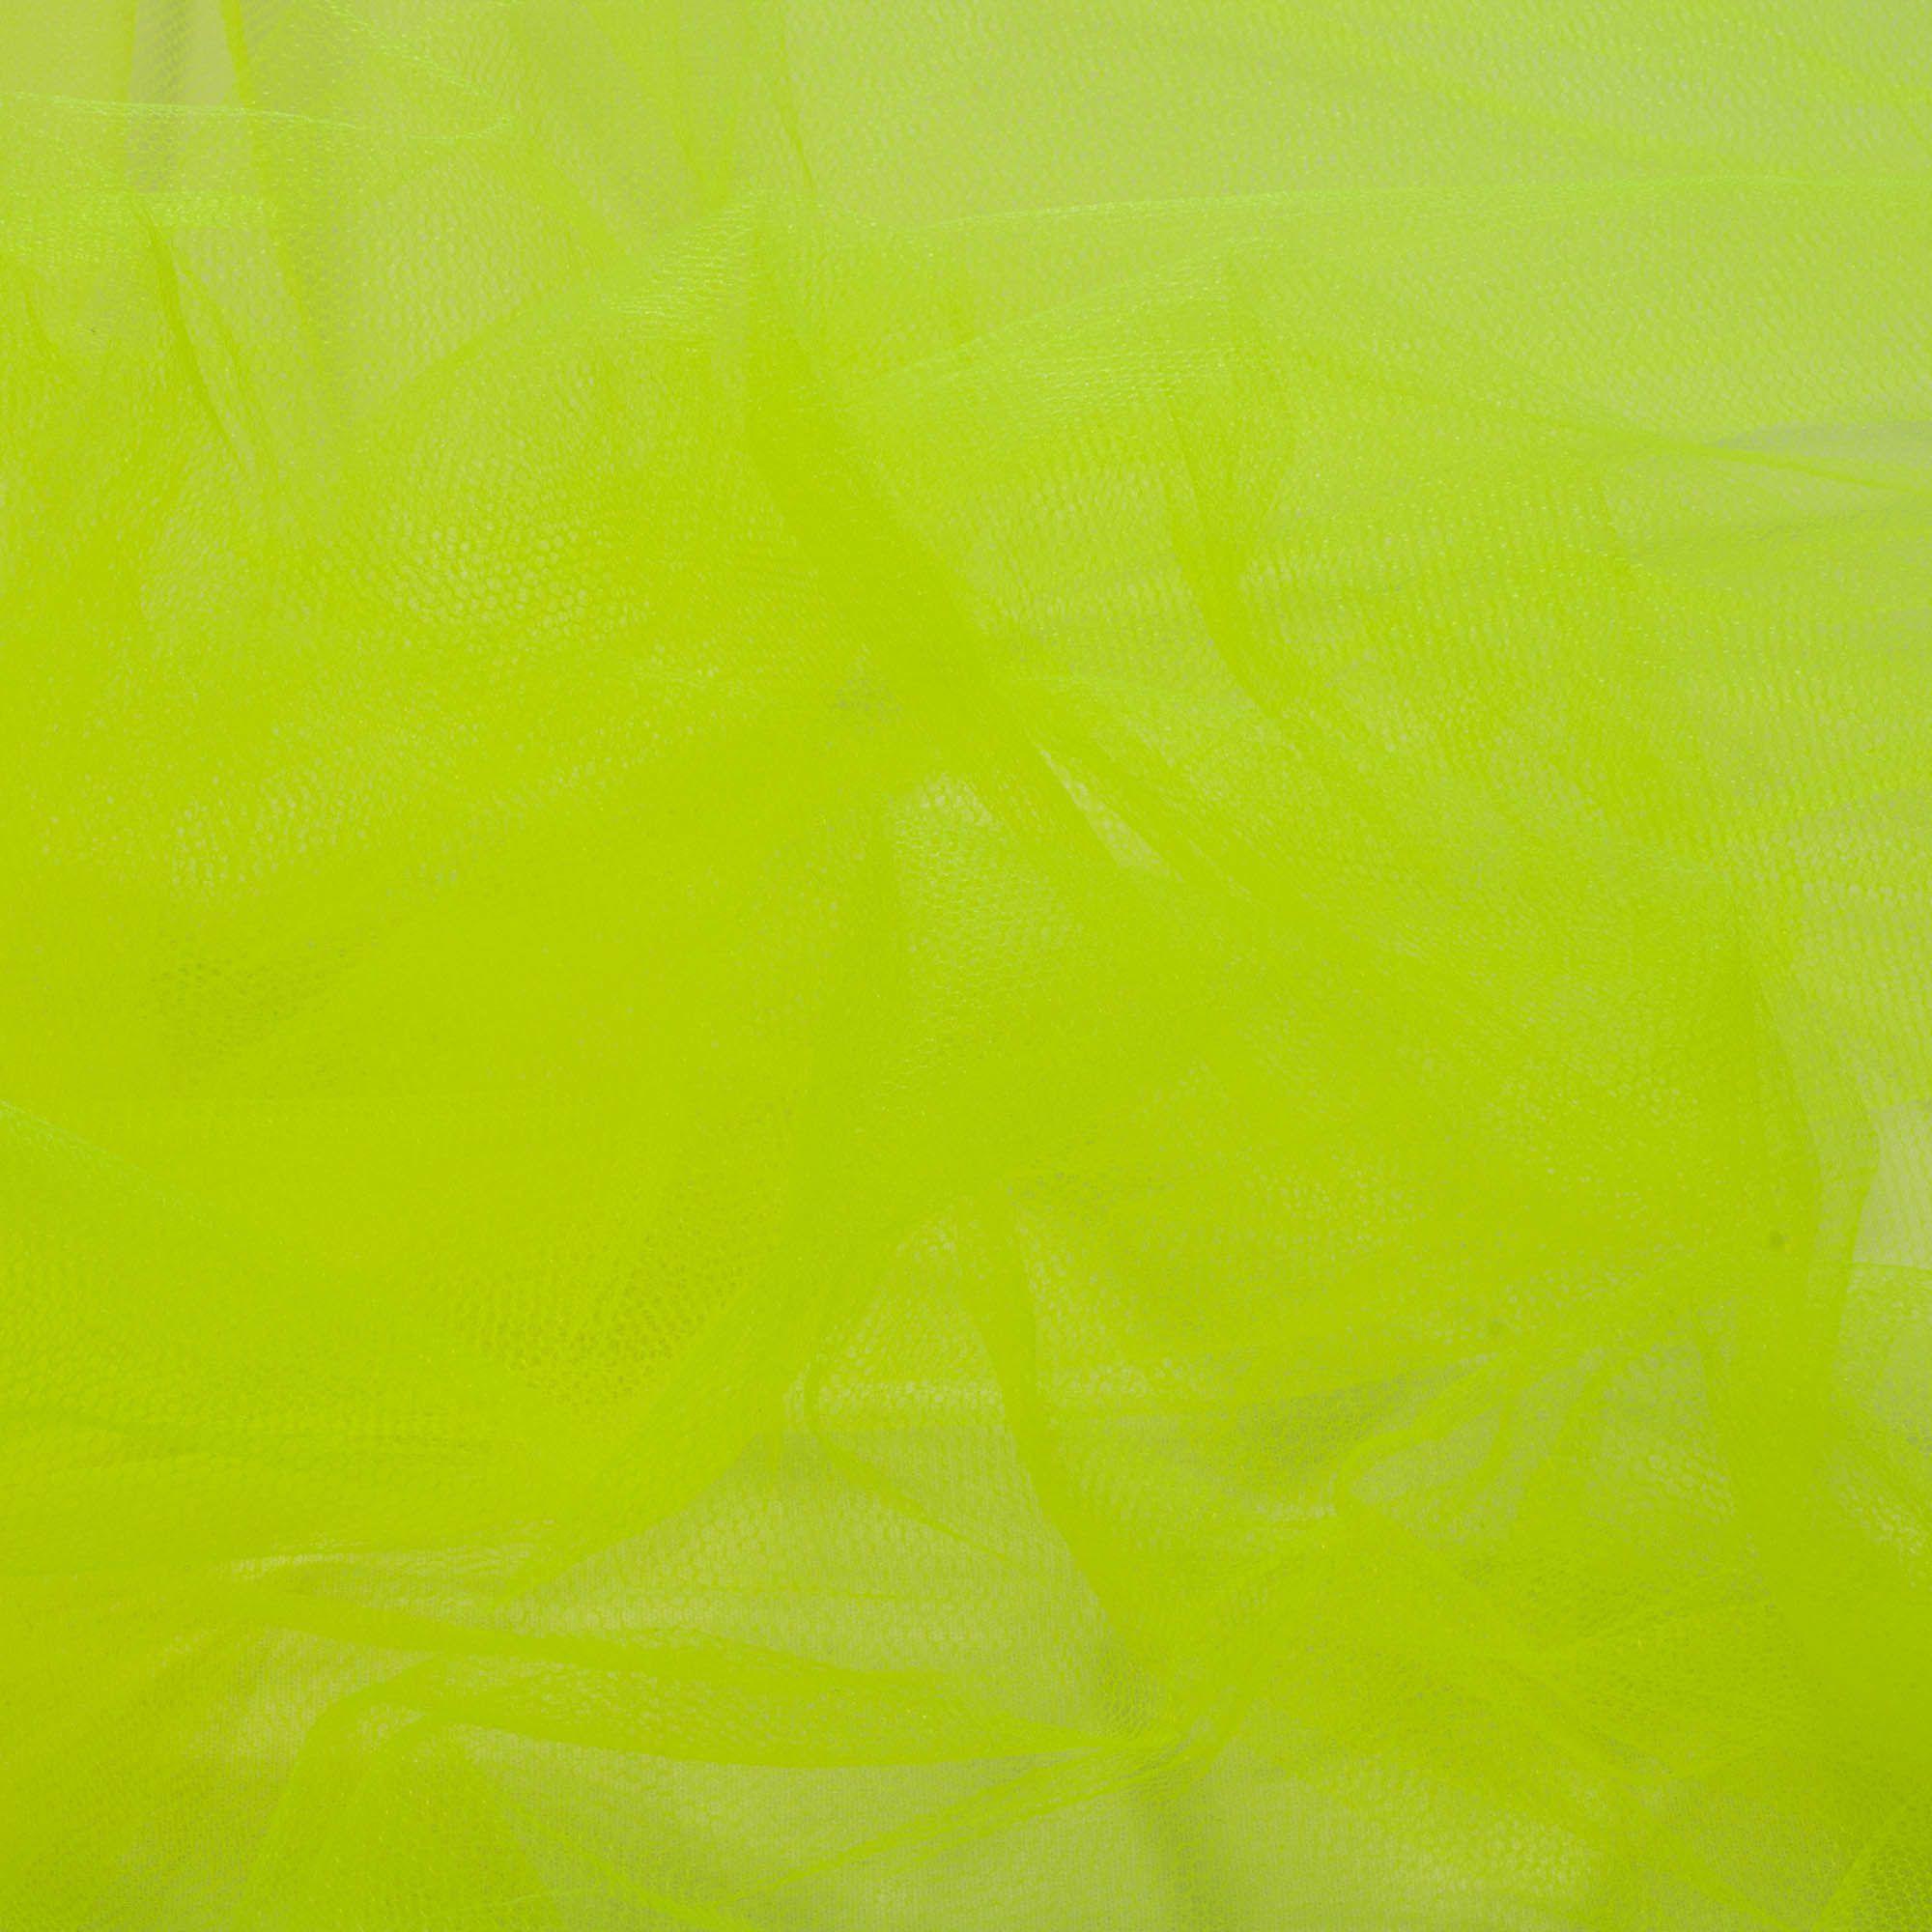 Tecido Tule Neon 100% Poliester 1,20 Mt Largura 008 Amarelo Limão